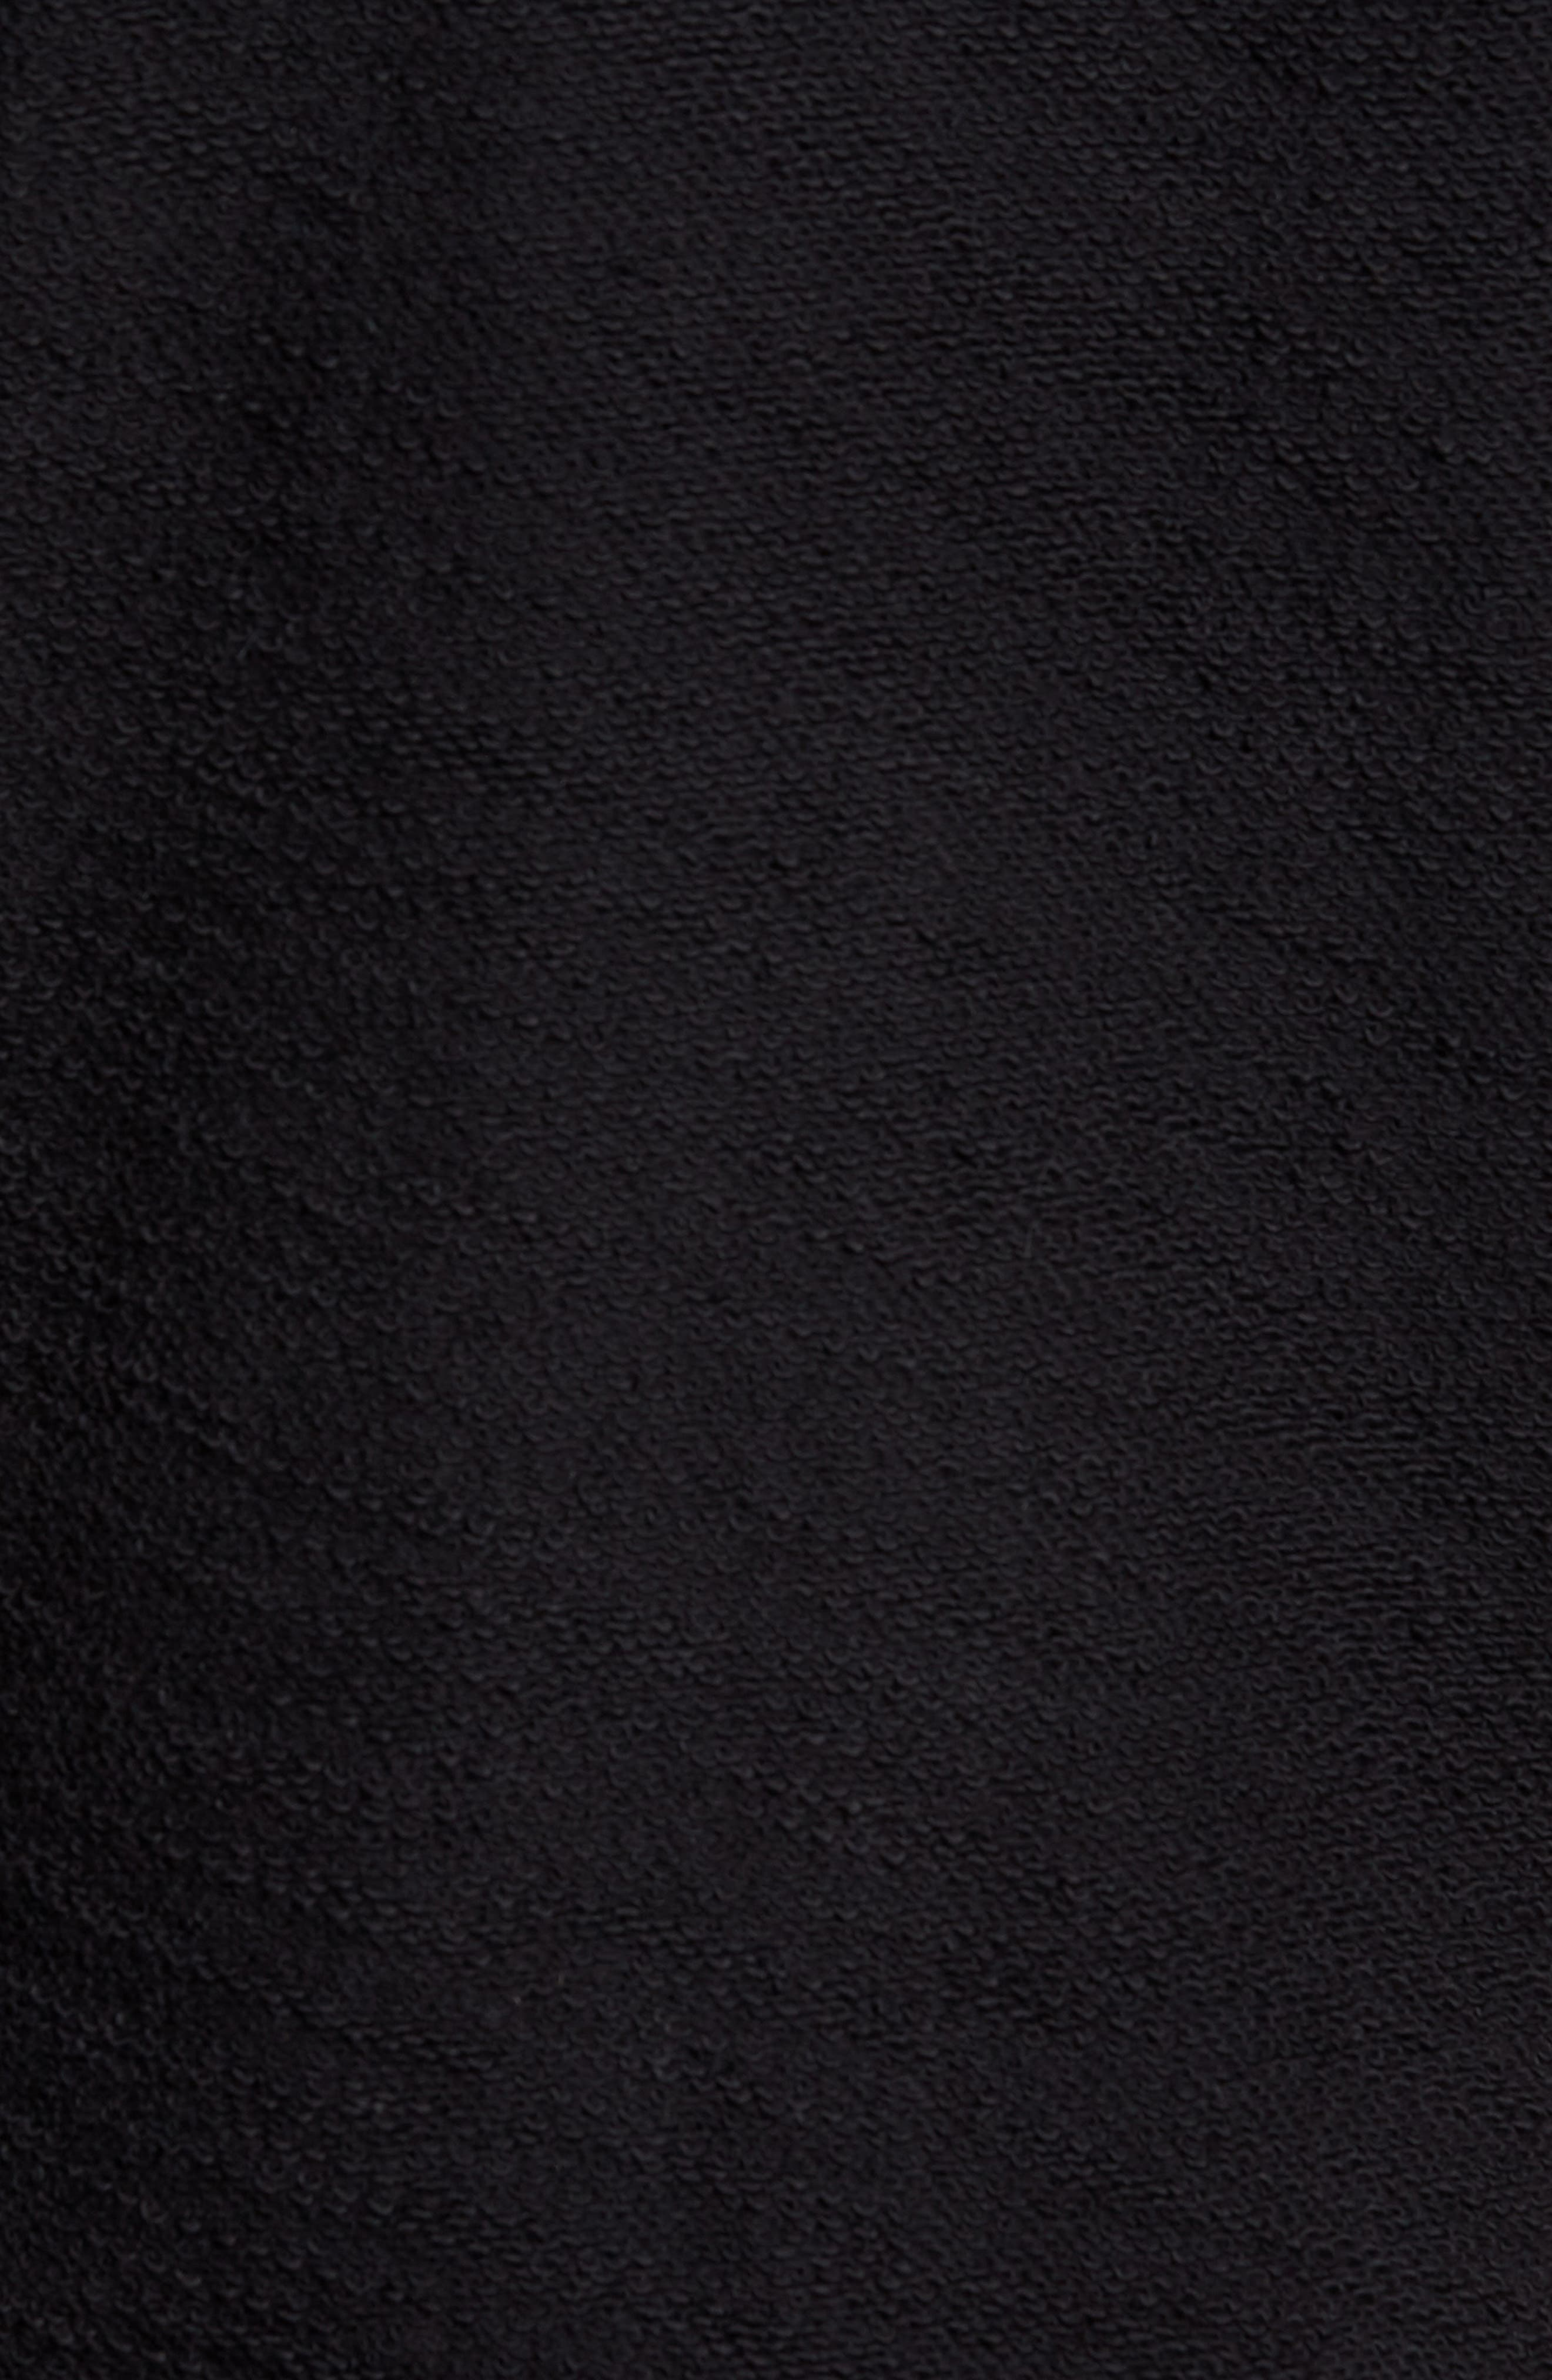 Terrycloth Cotton Blend Zip Hoodie,                             Alternate thumbnail 5, color,                             Black